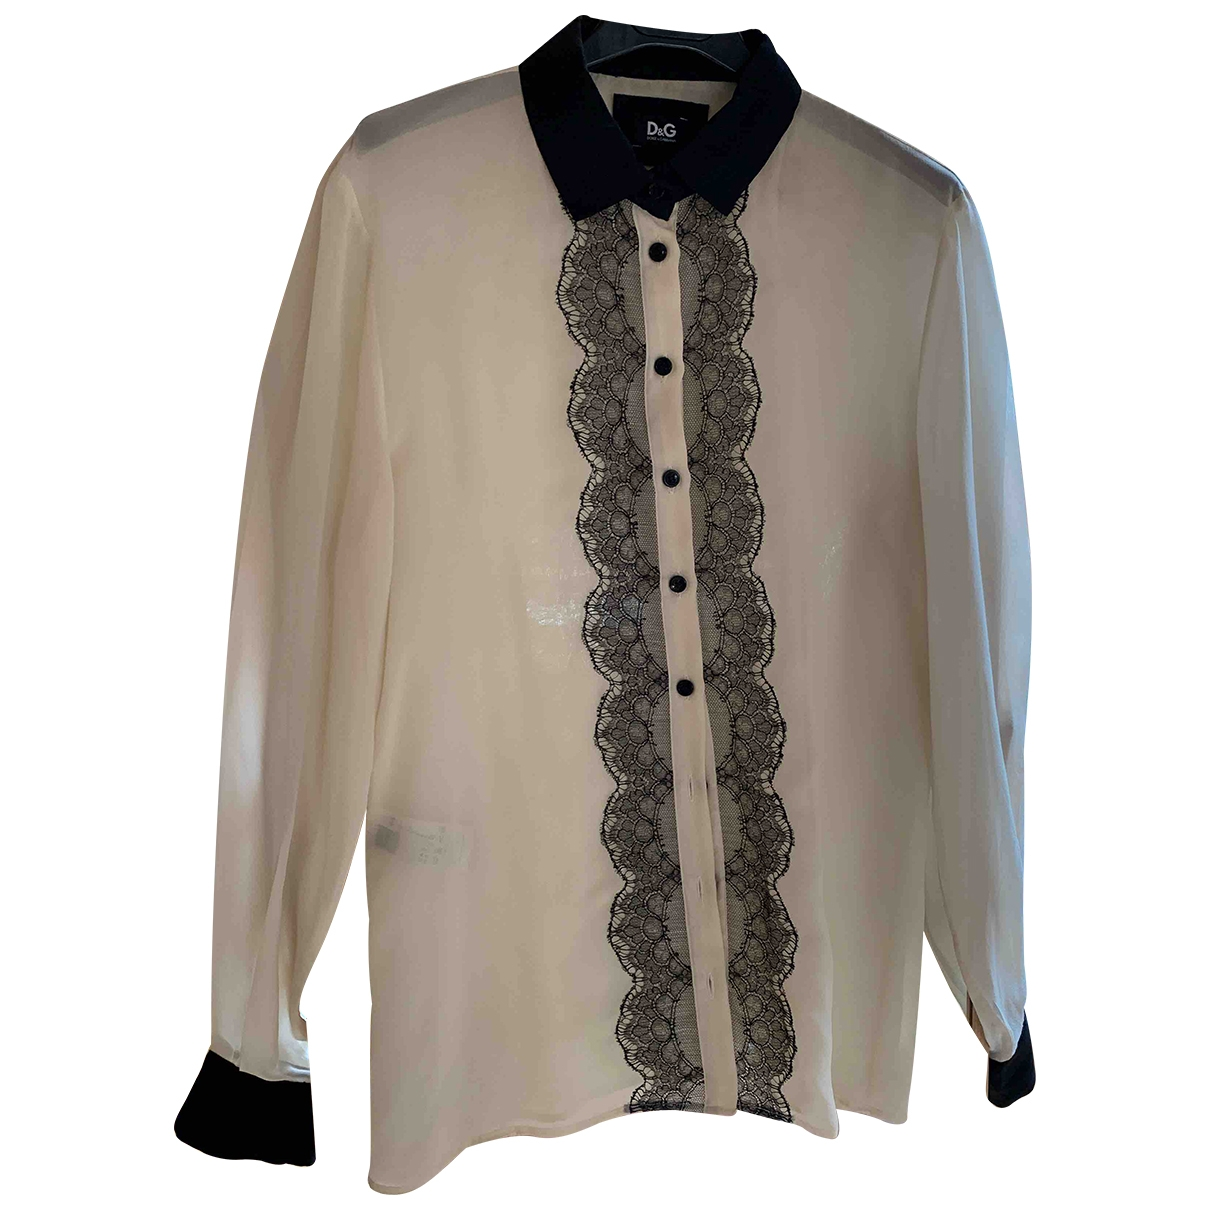 Camisa de Seda D&g